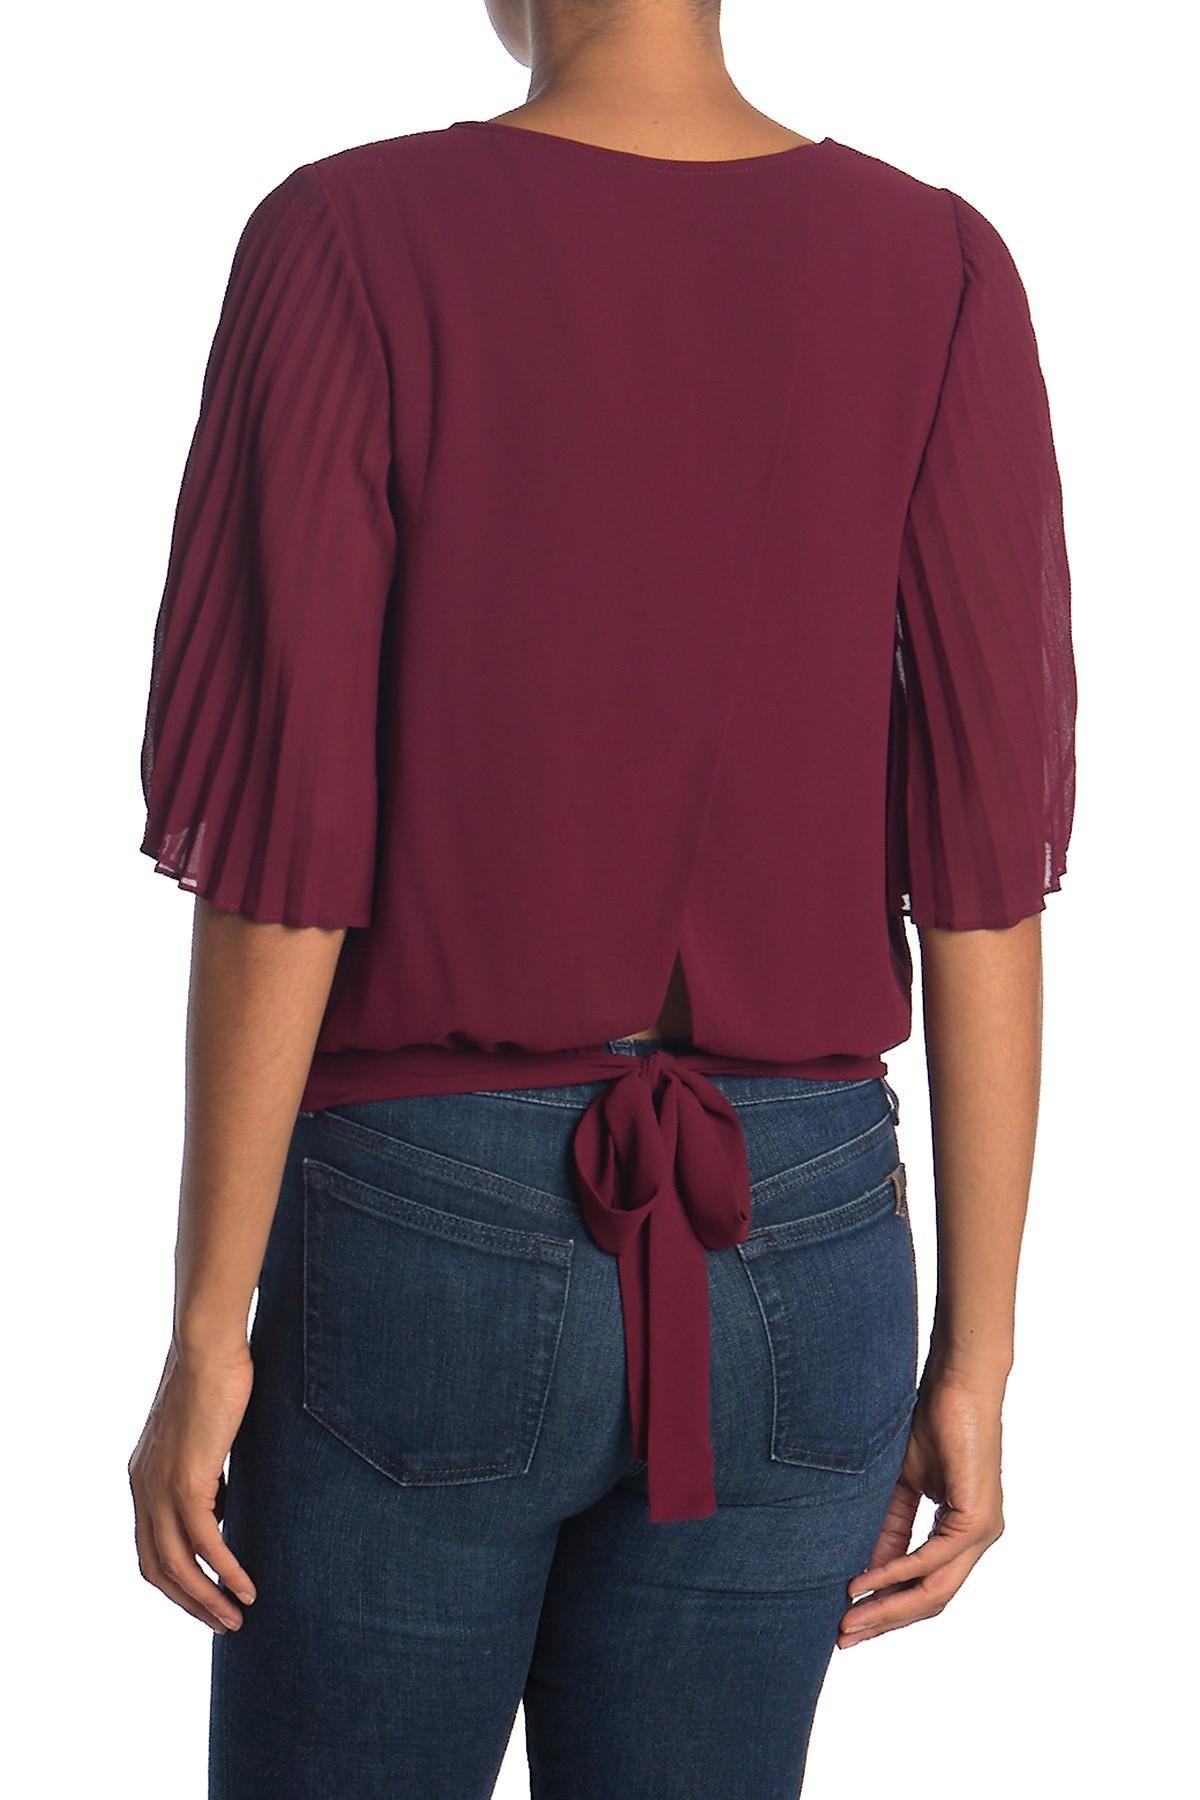 REMY COLLARLESS BLOUSE | Collarless blouse, Collarless, Blouse